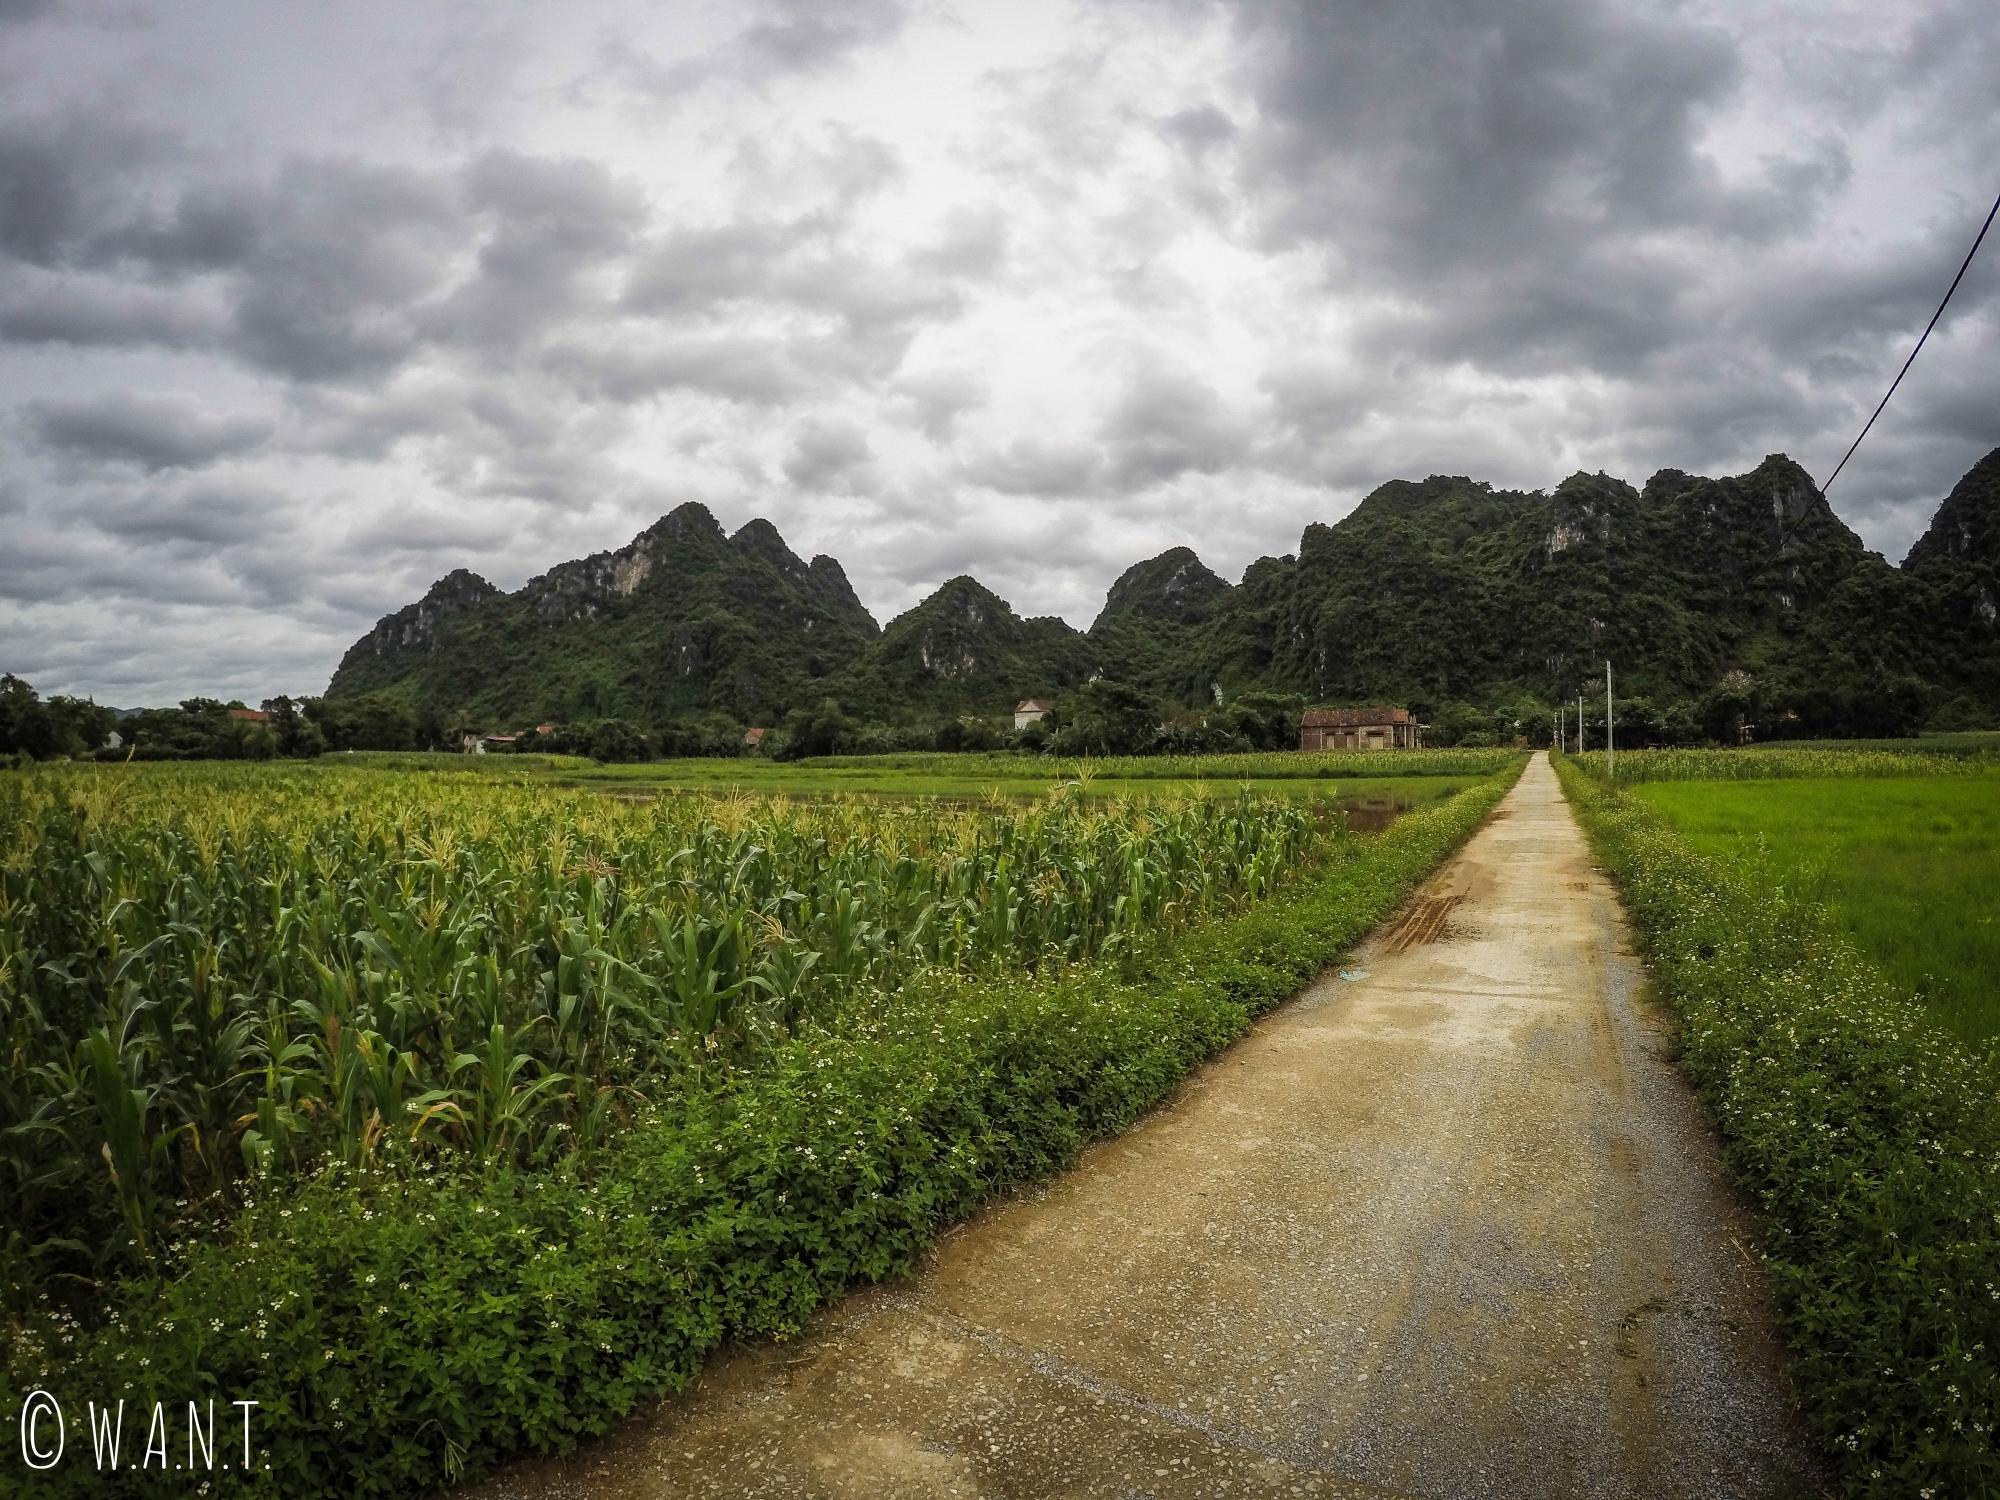 Chemin, cultures et pics karstiques à Phong Nha